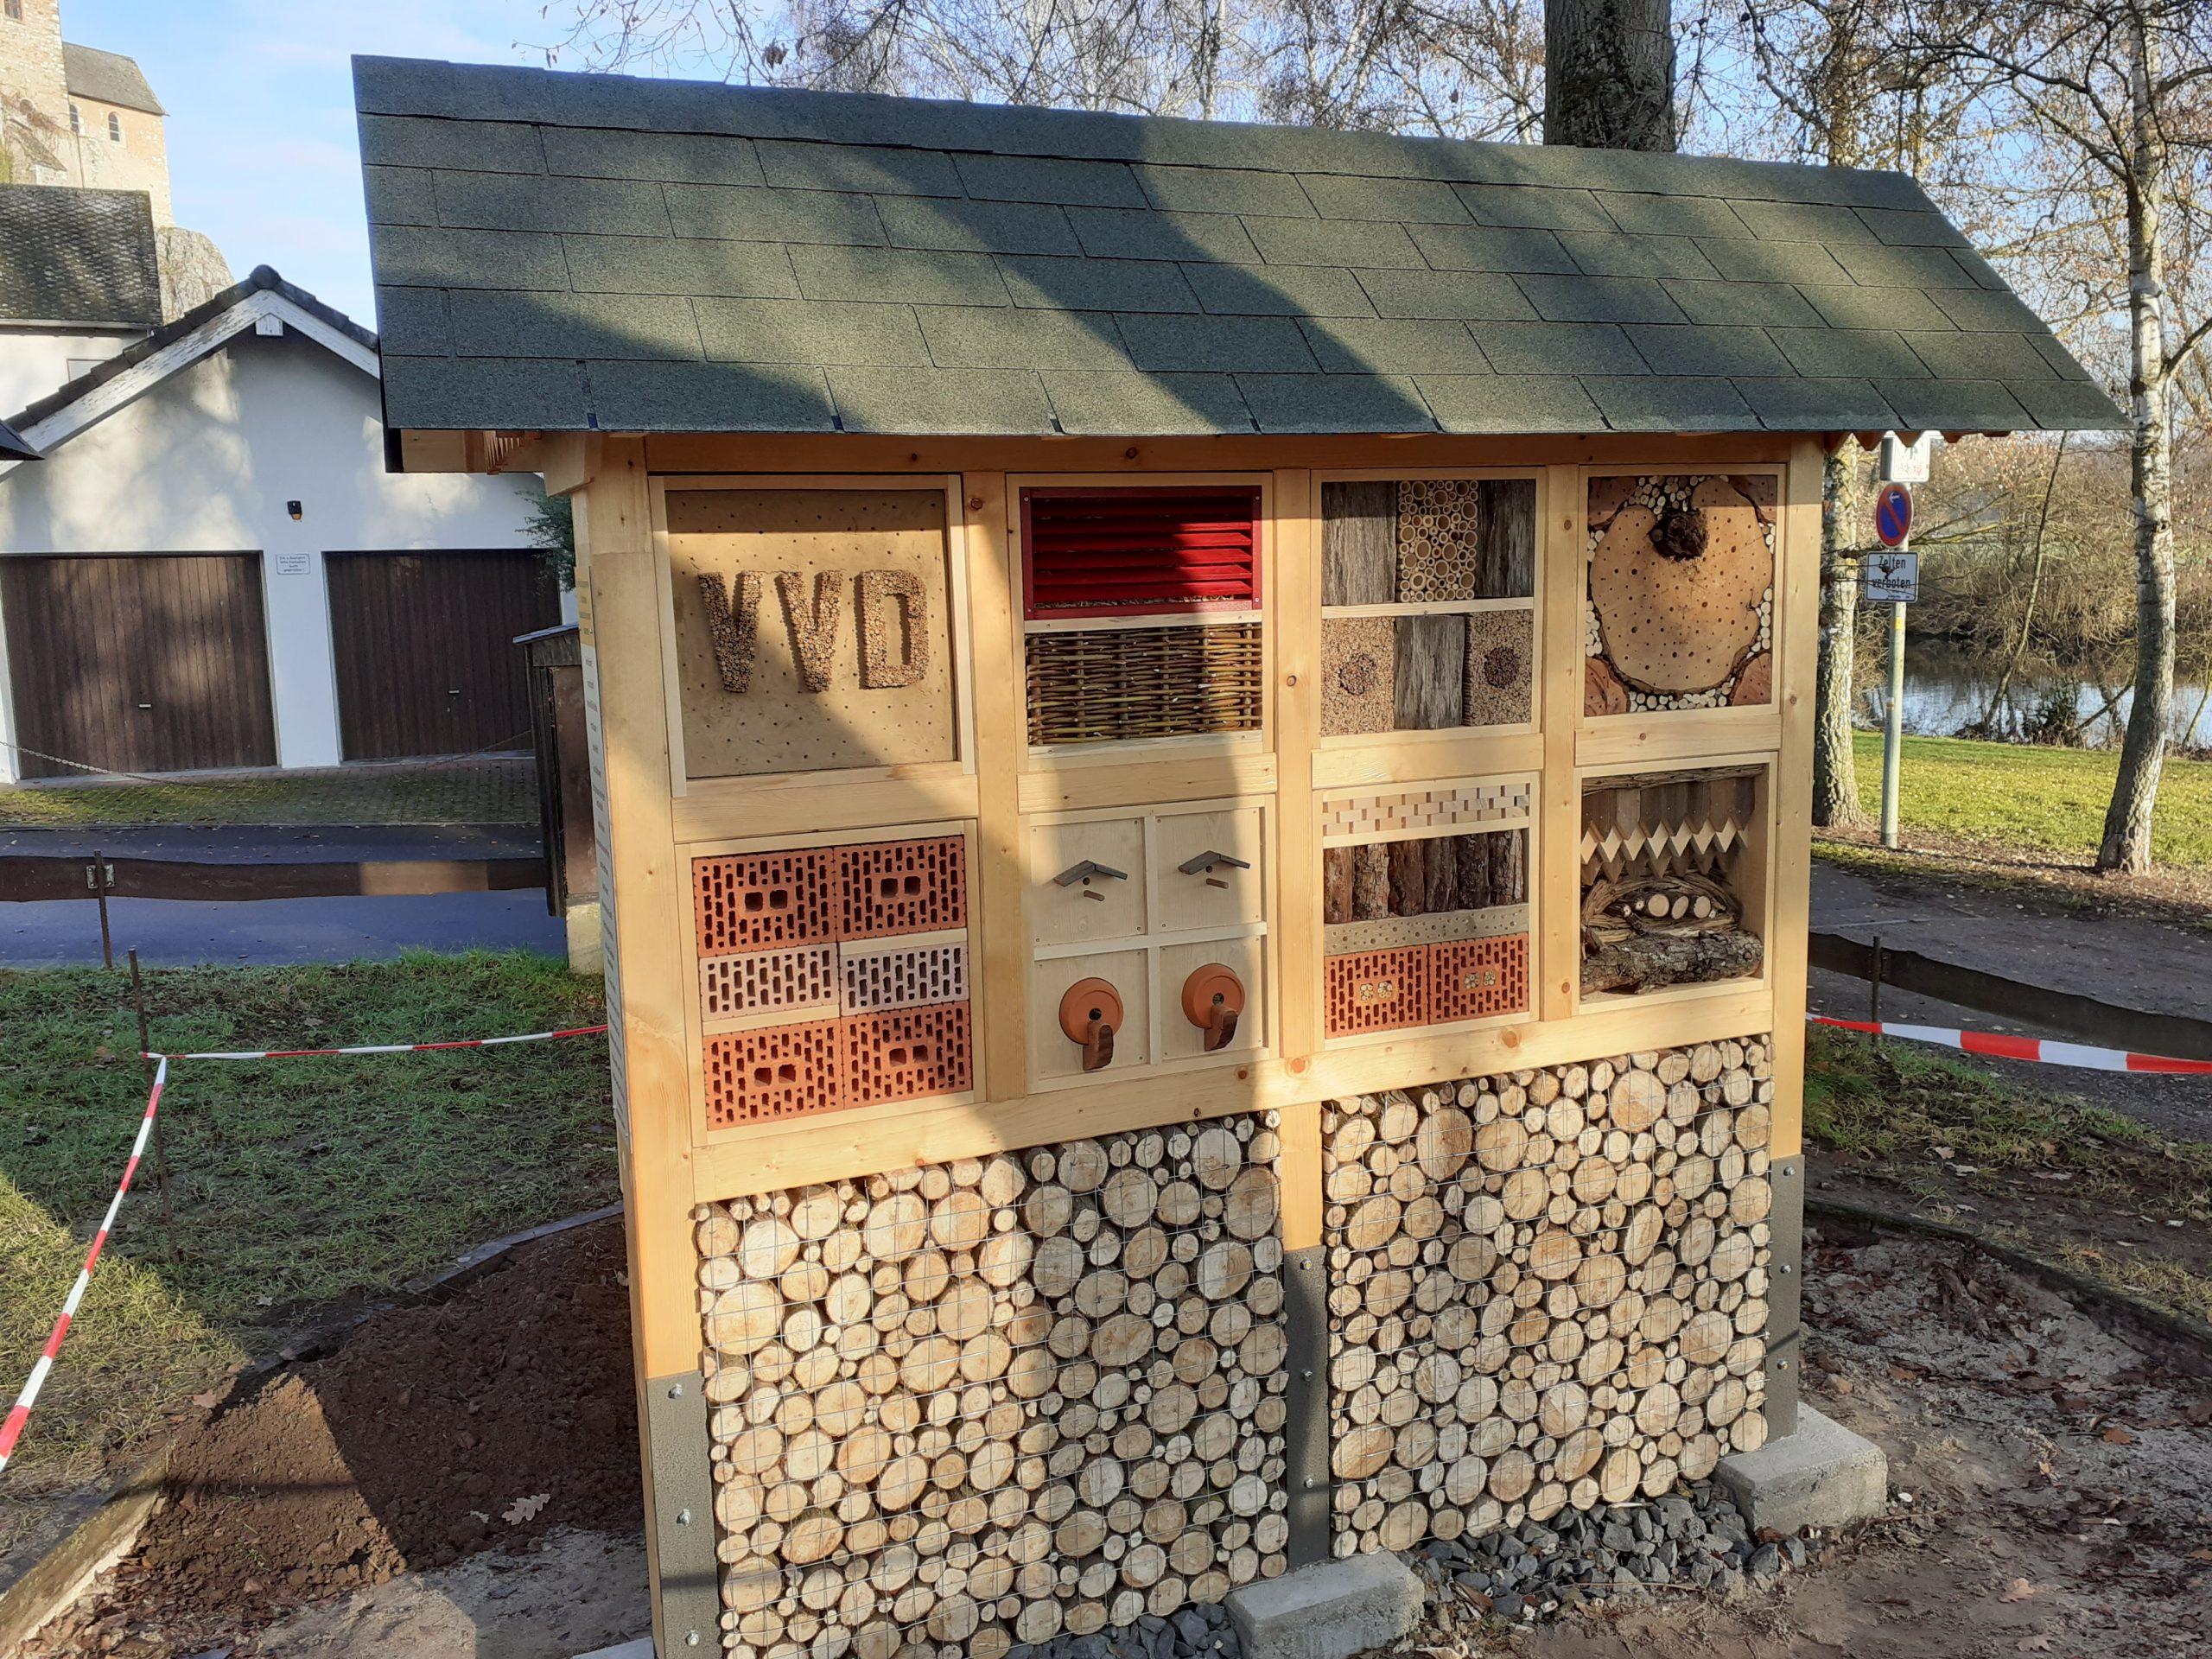 Insektenhotel in Lahnanlage fertig gestellt